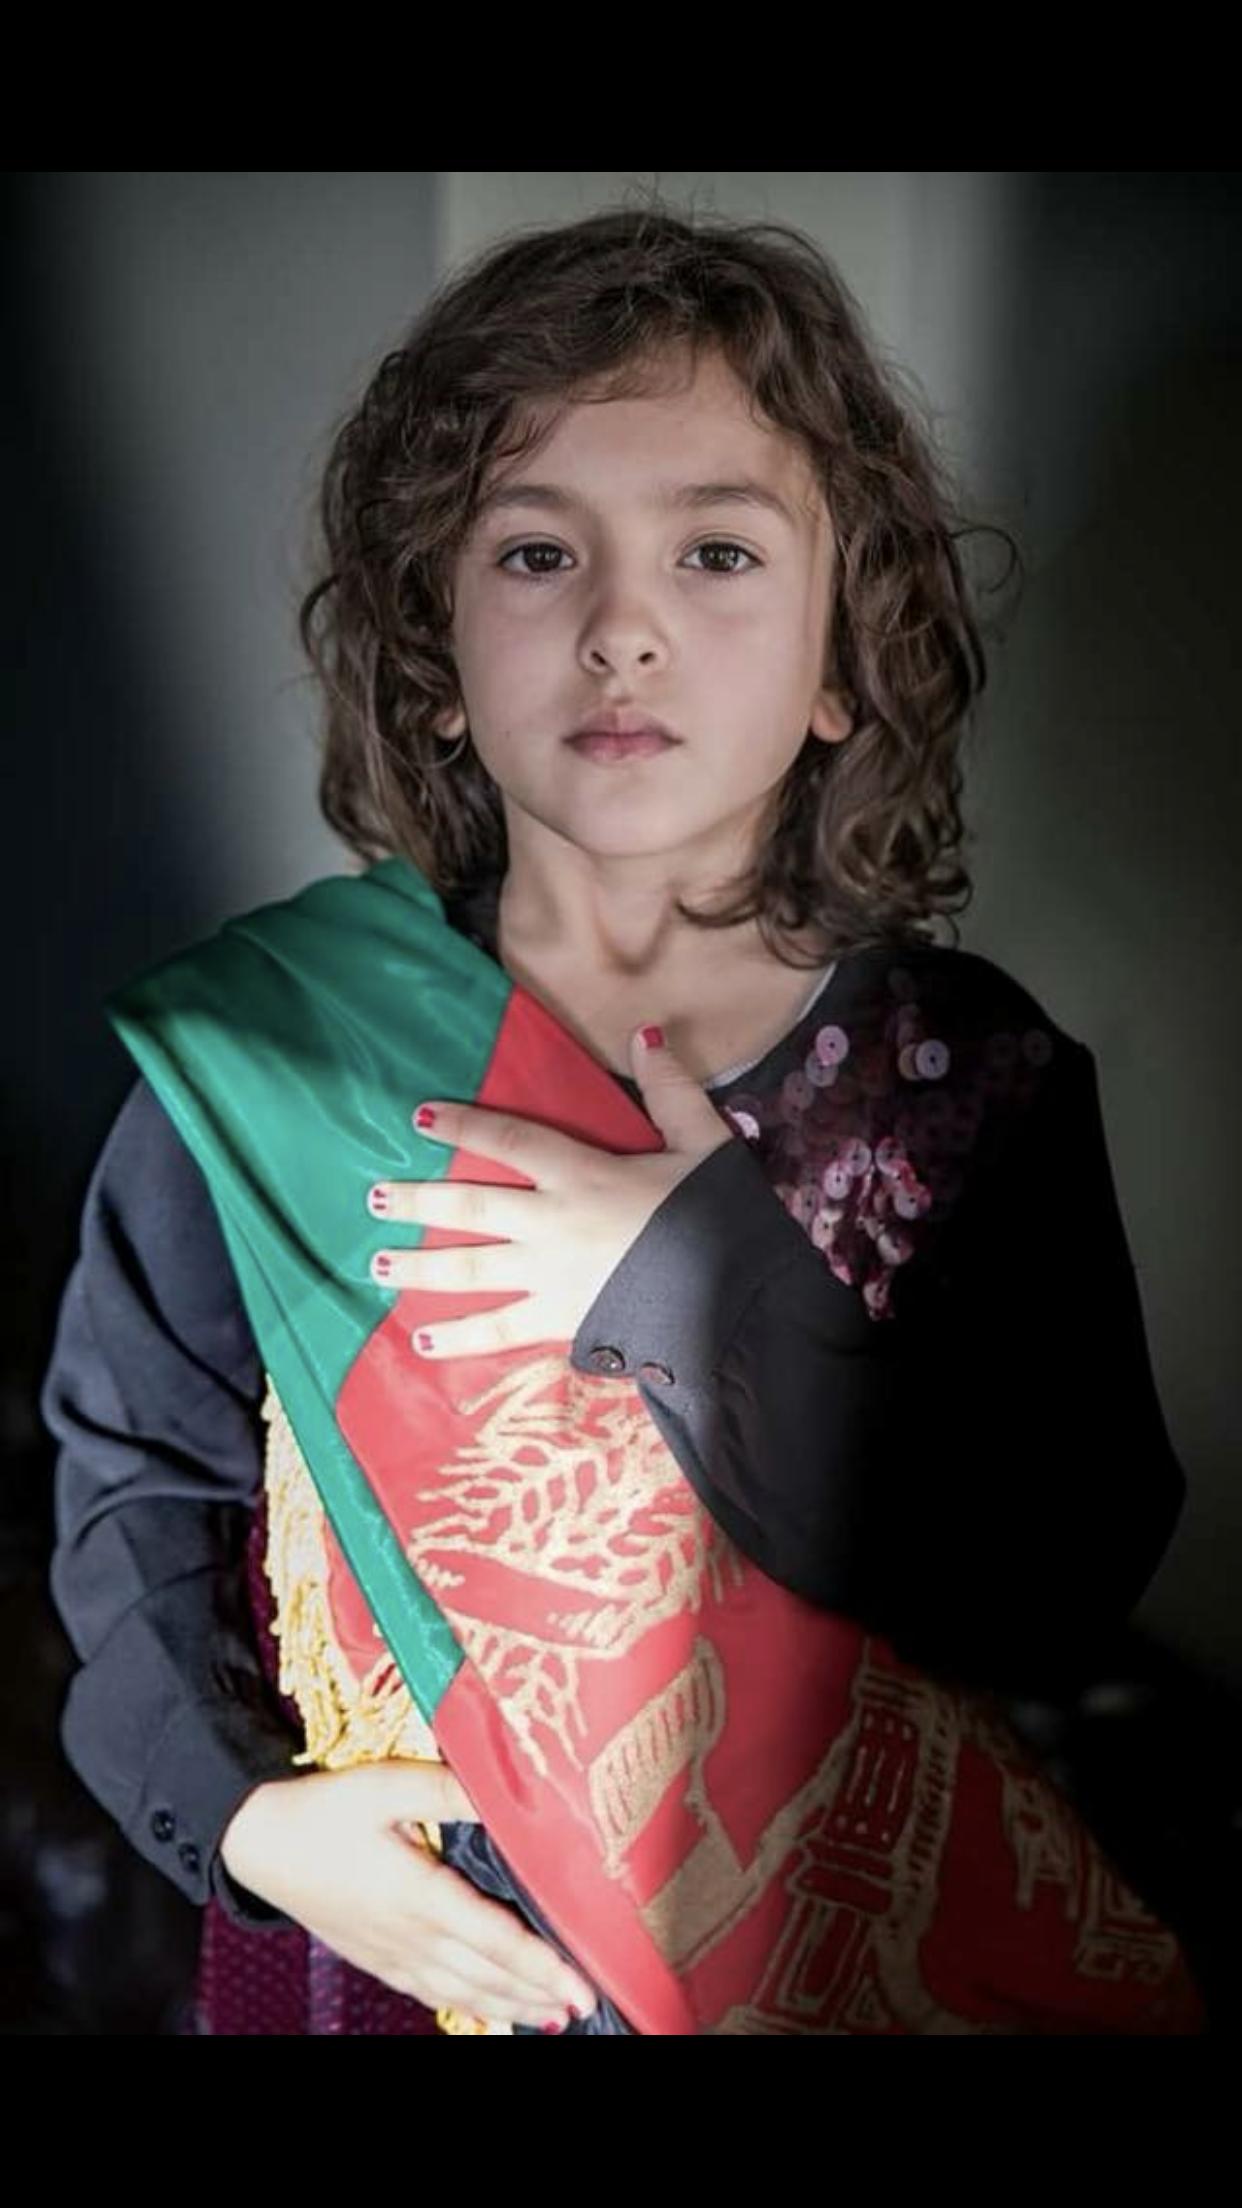 Stylish afghanistan flag exclusive photo